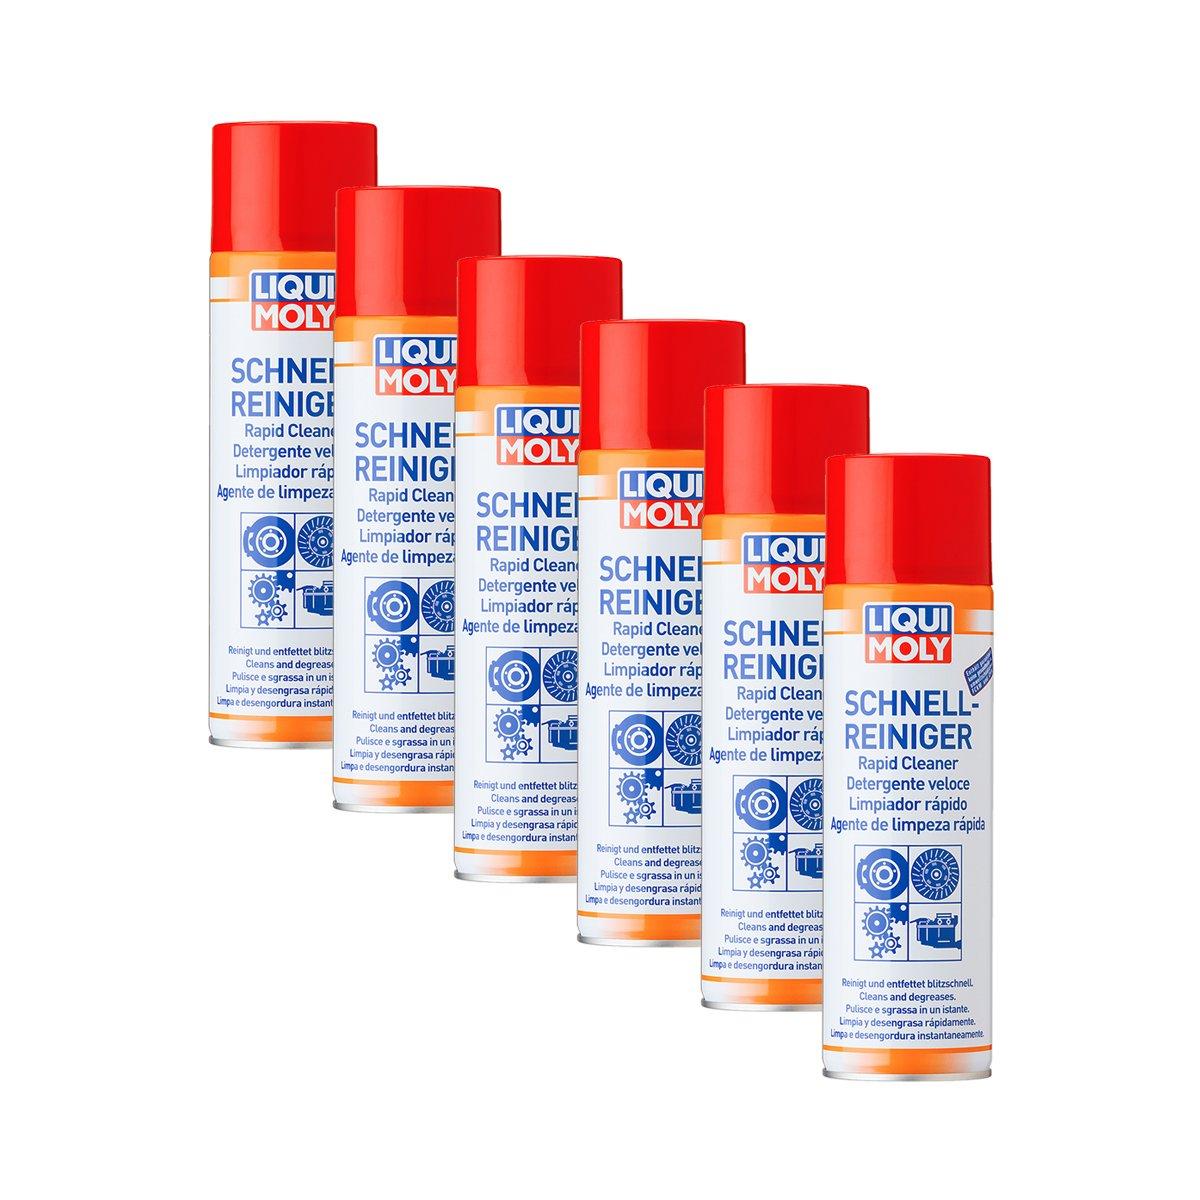 6 x Liqui Moly 3318 rá pido limpiador de freno spray limpiador 500 ml